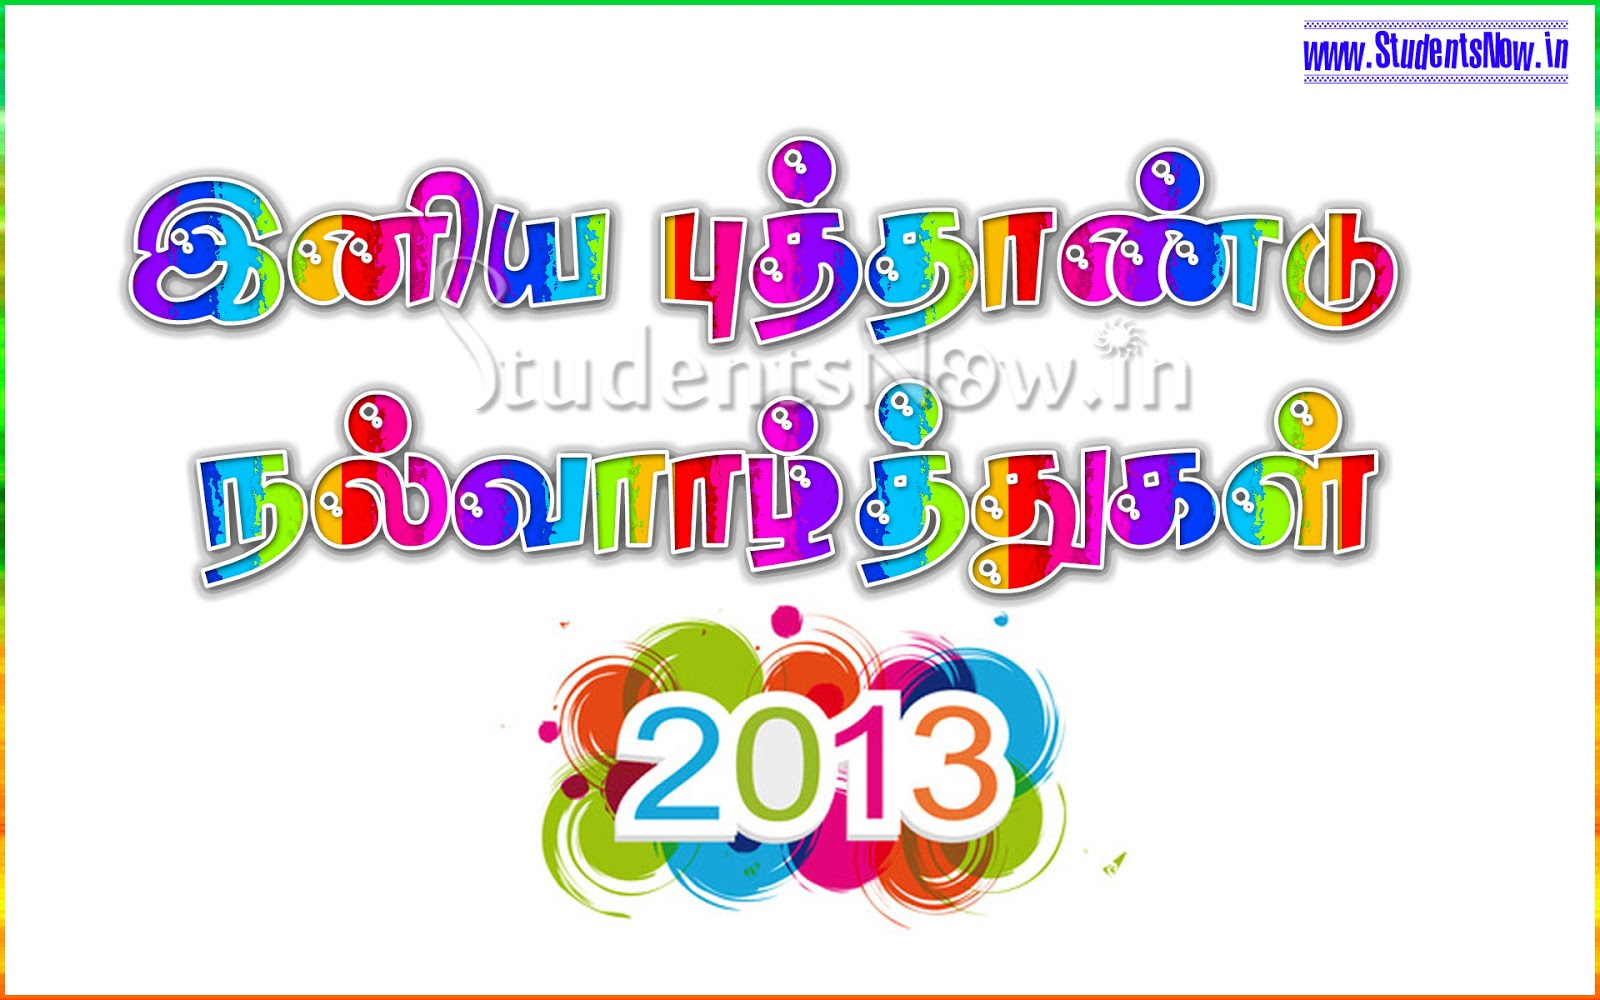 New Year 2013 Greetings In Tamil